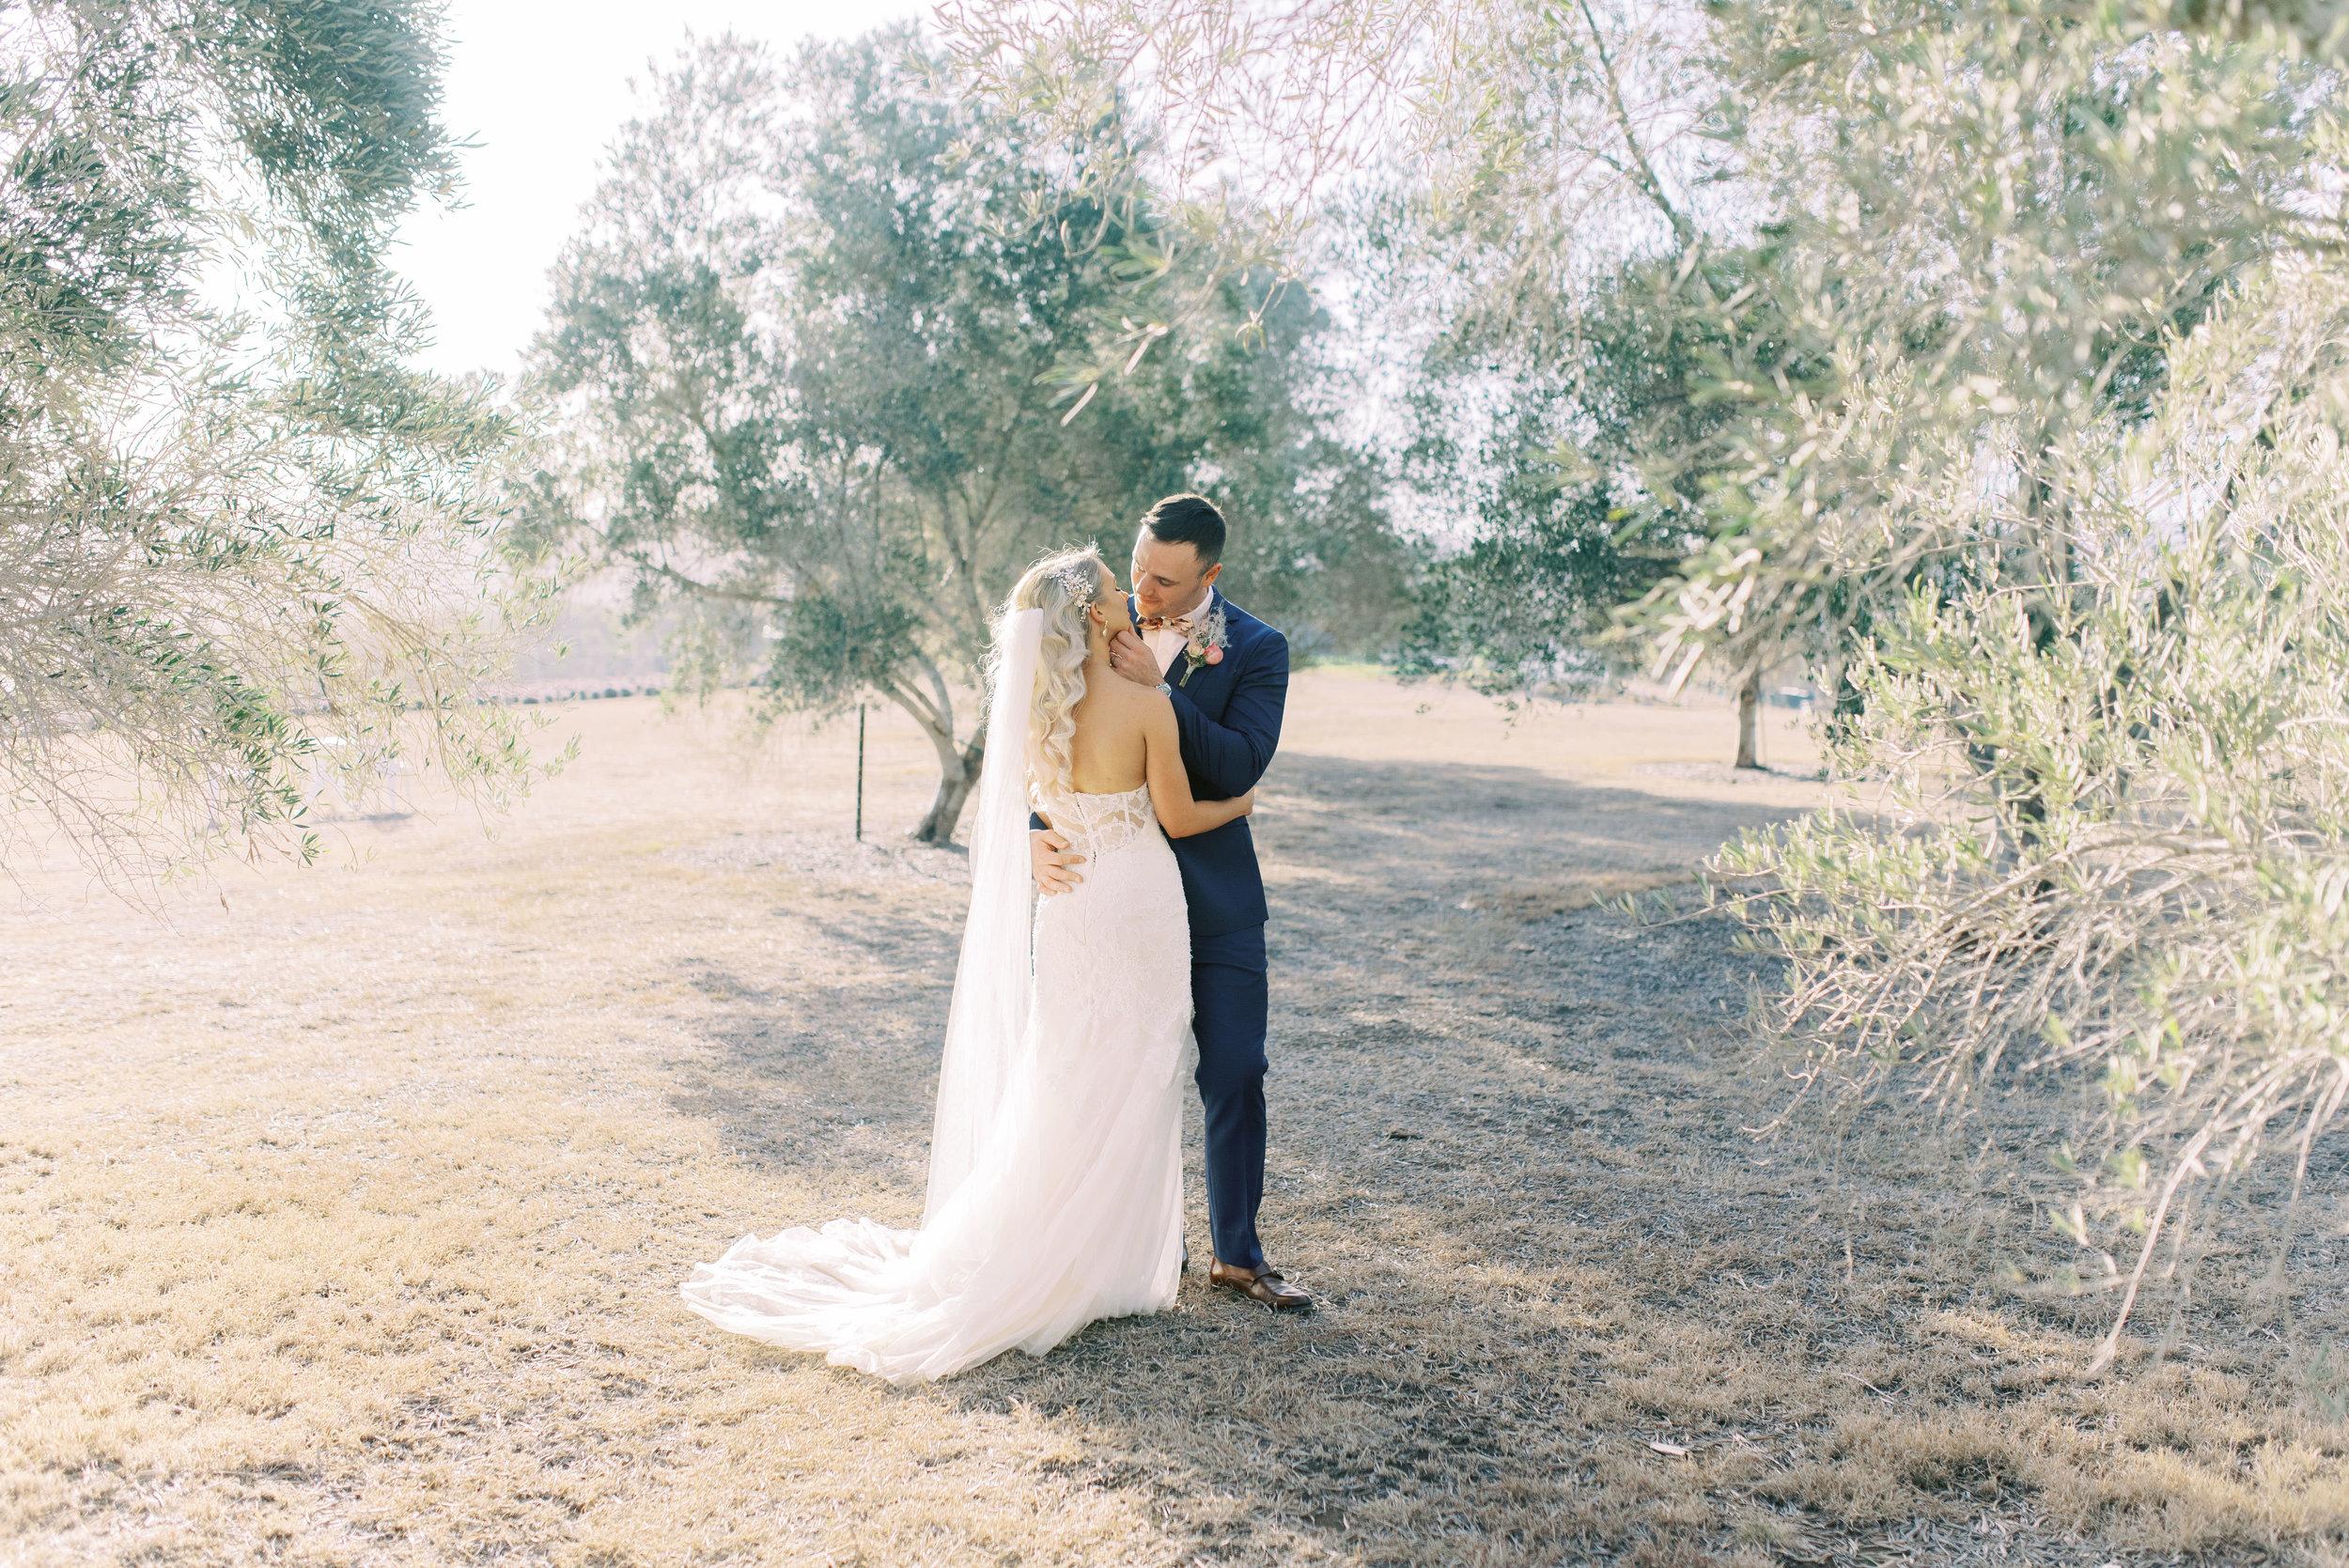 Kooroomba-Vineyard-Lavender-Farm-Wedding-Fine-Art-Lauren-Olivia-56.jpg